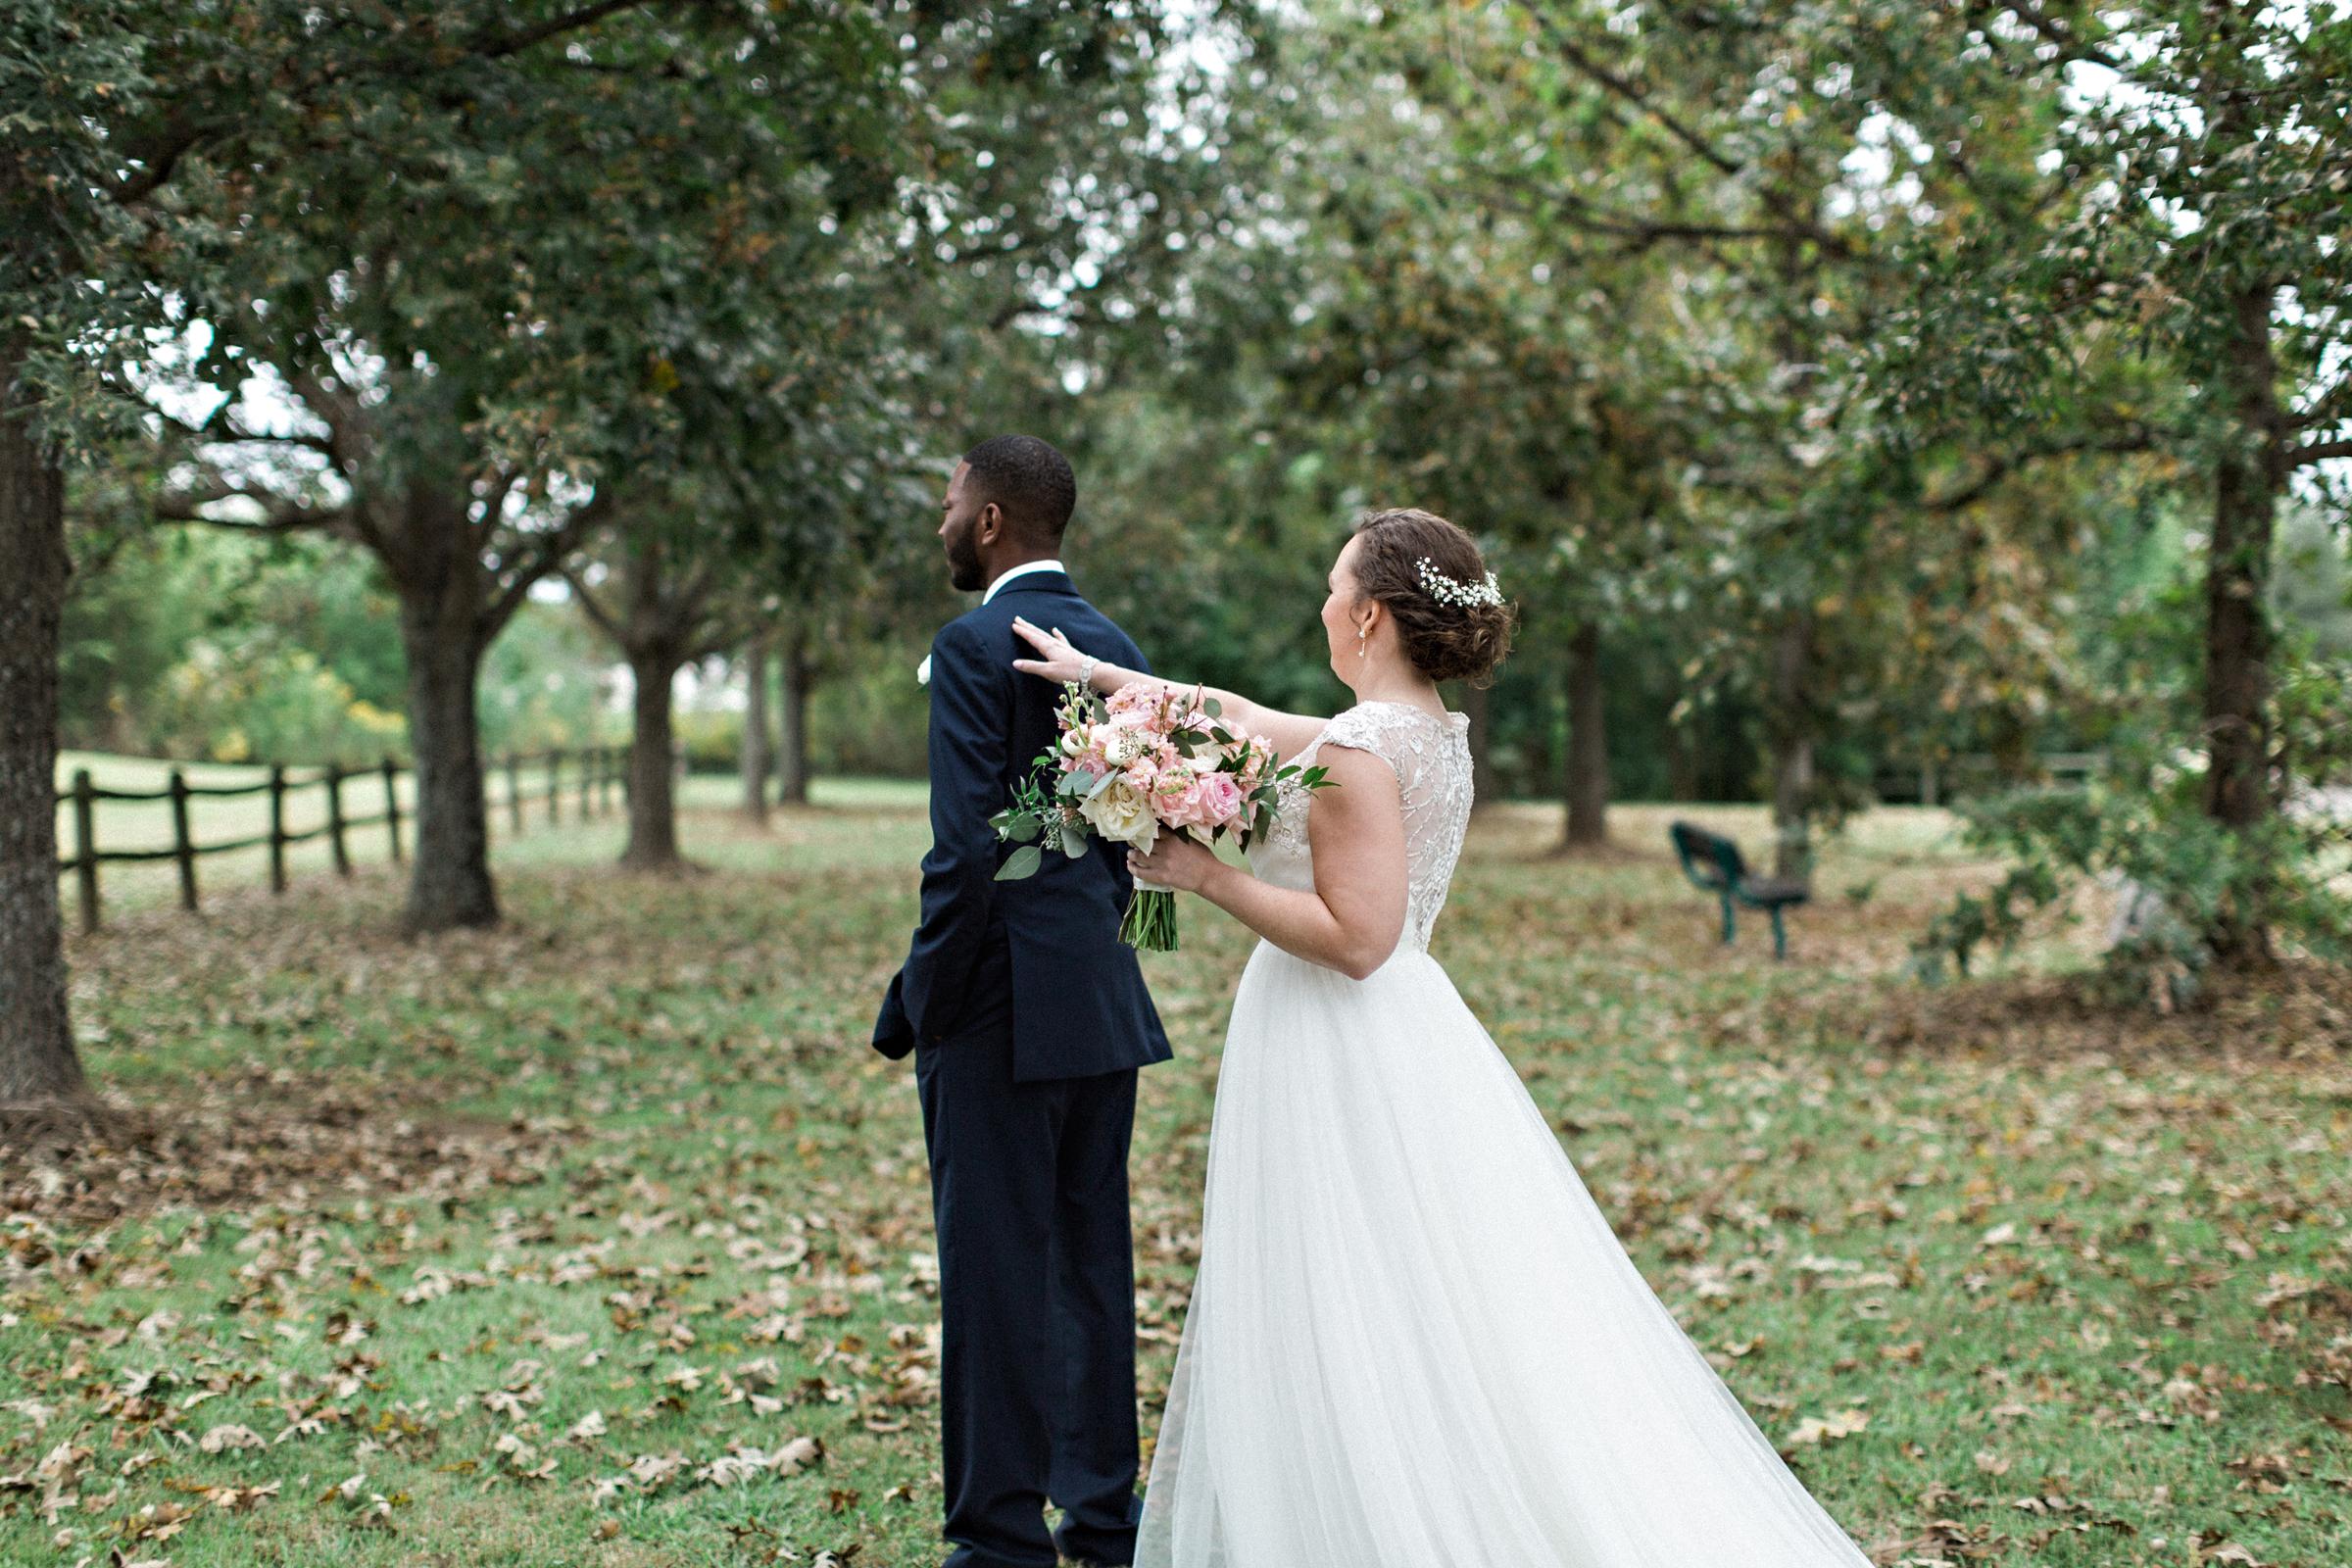 Alabama-Wedding-Photography-Nick-Drollette-Cory-Laura-117.jpg